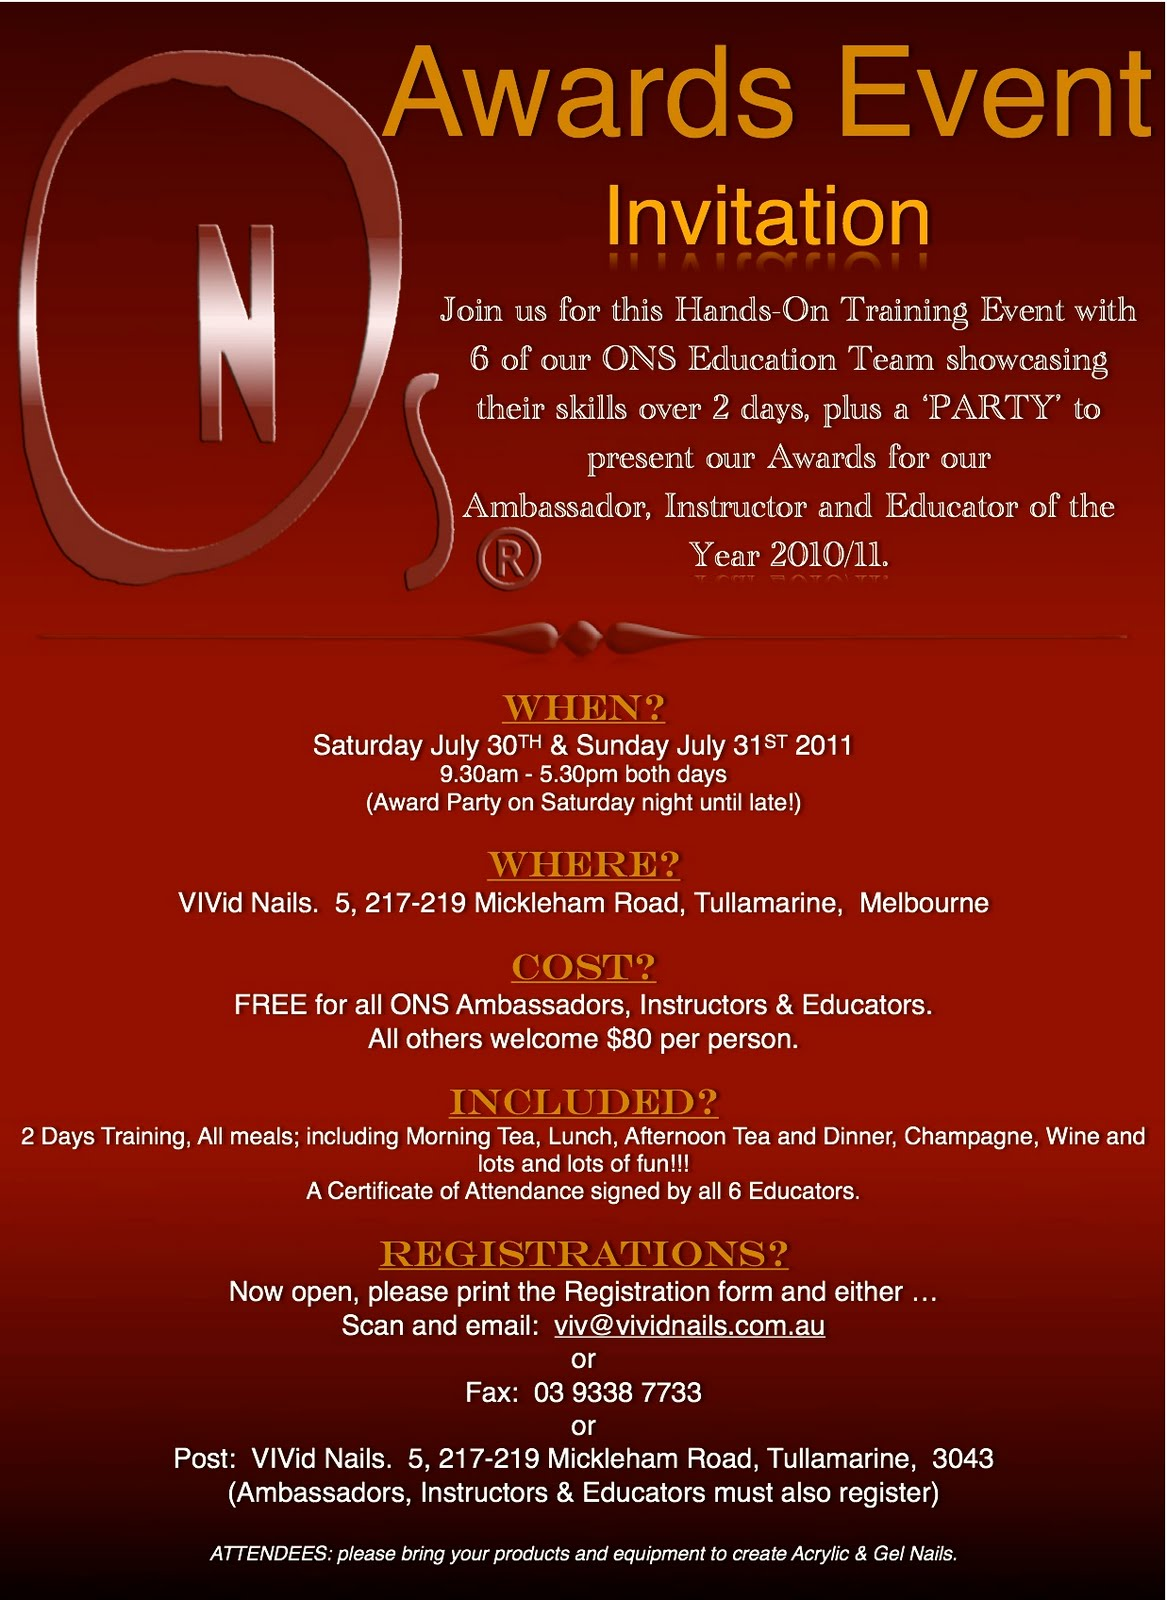 Event Program For Awards Ceremonyscholarship Program ... - photo#42